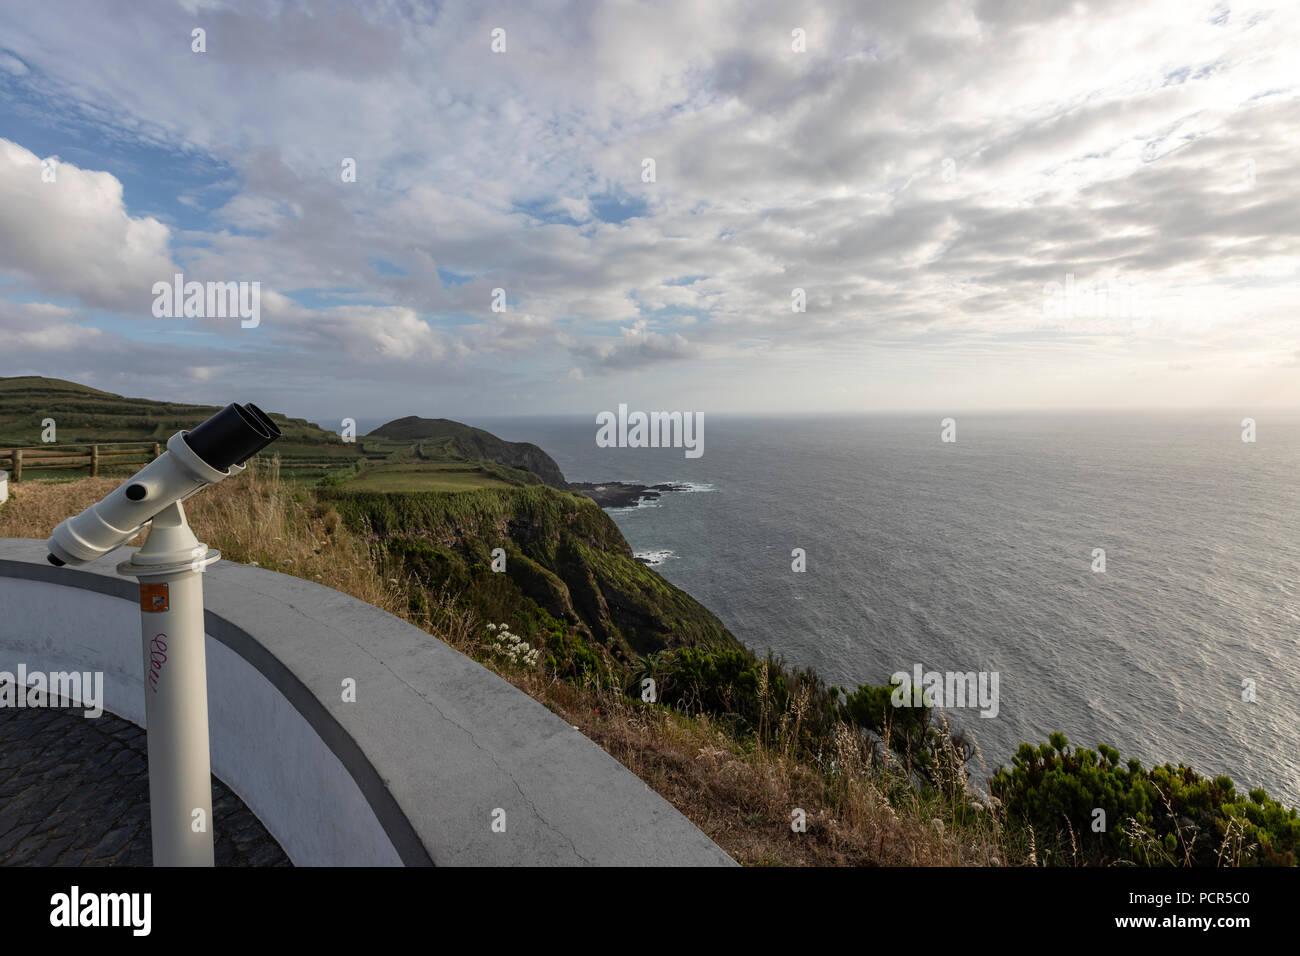 Binocular at the viewpoint from Miradouro da Ponta do Escalvado, Varzea, Sao Miguel island, Azores, Portugal - Stock Image